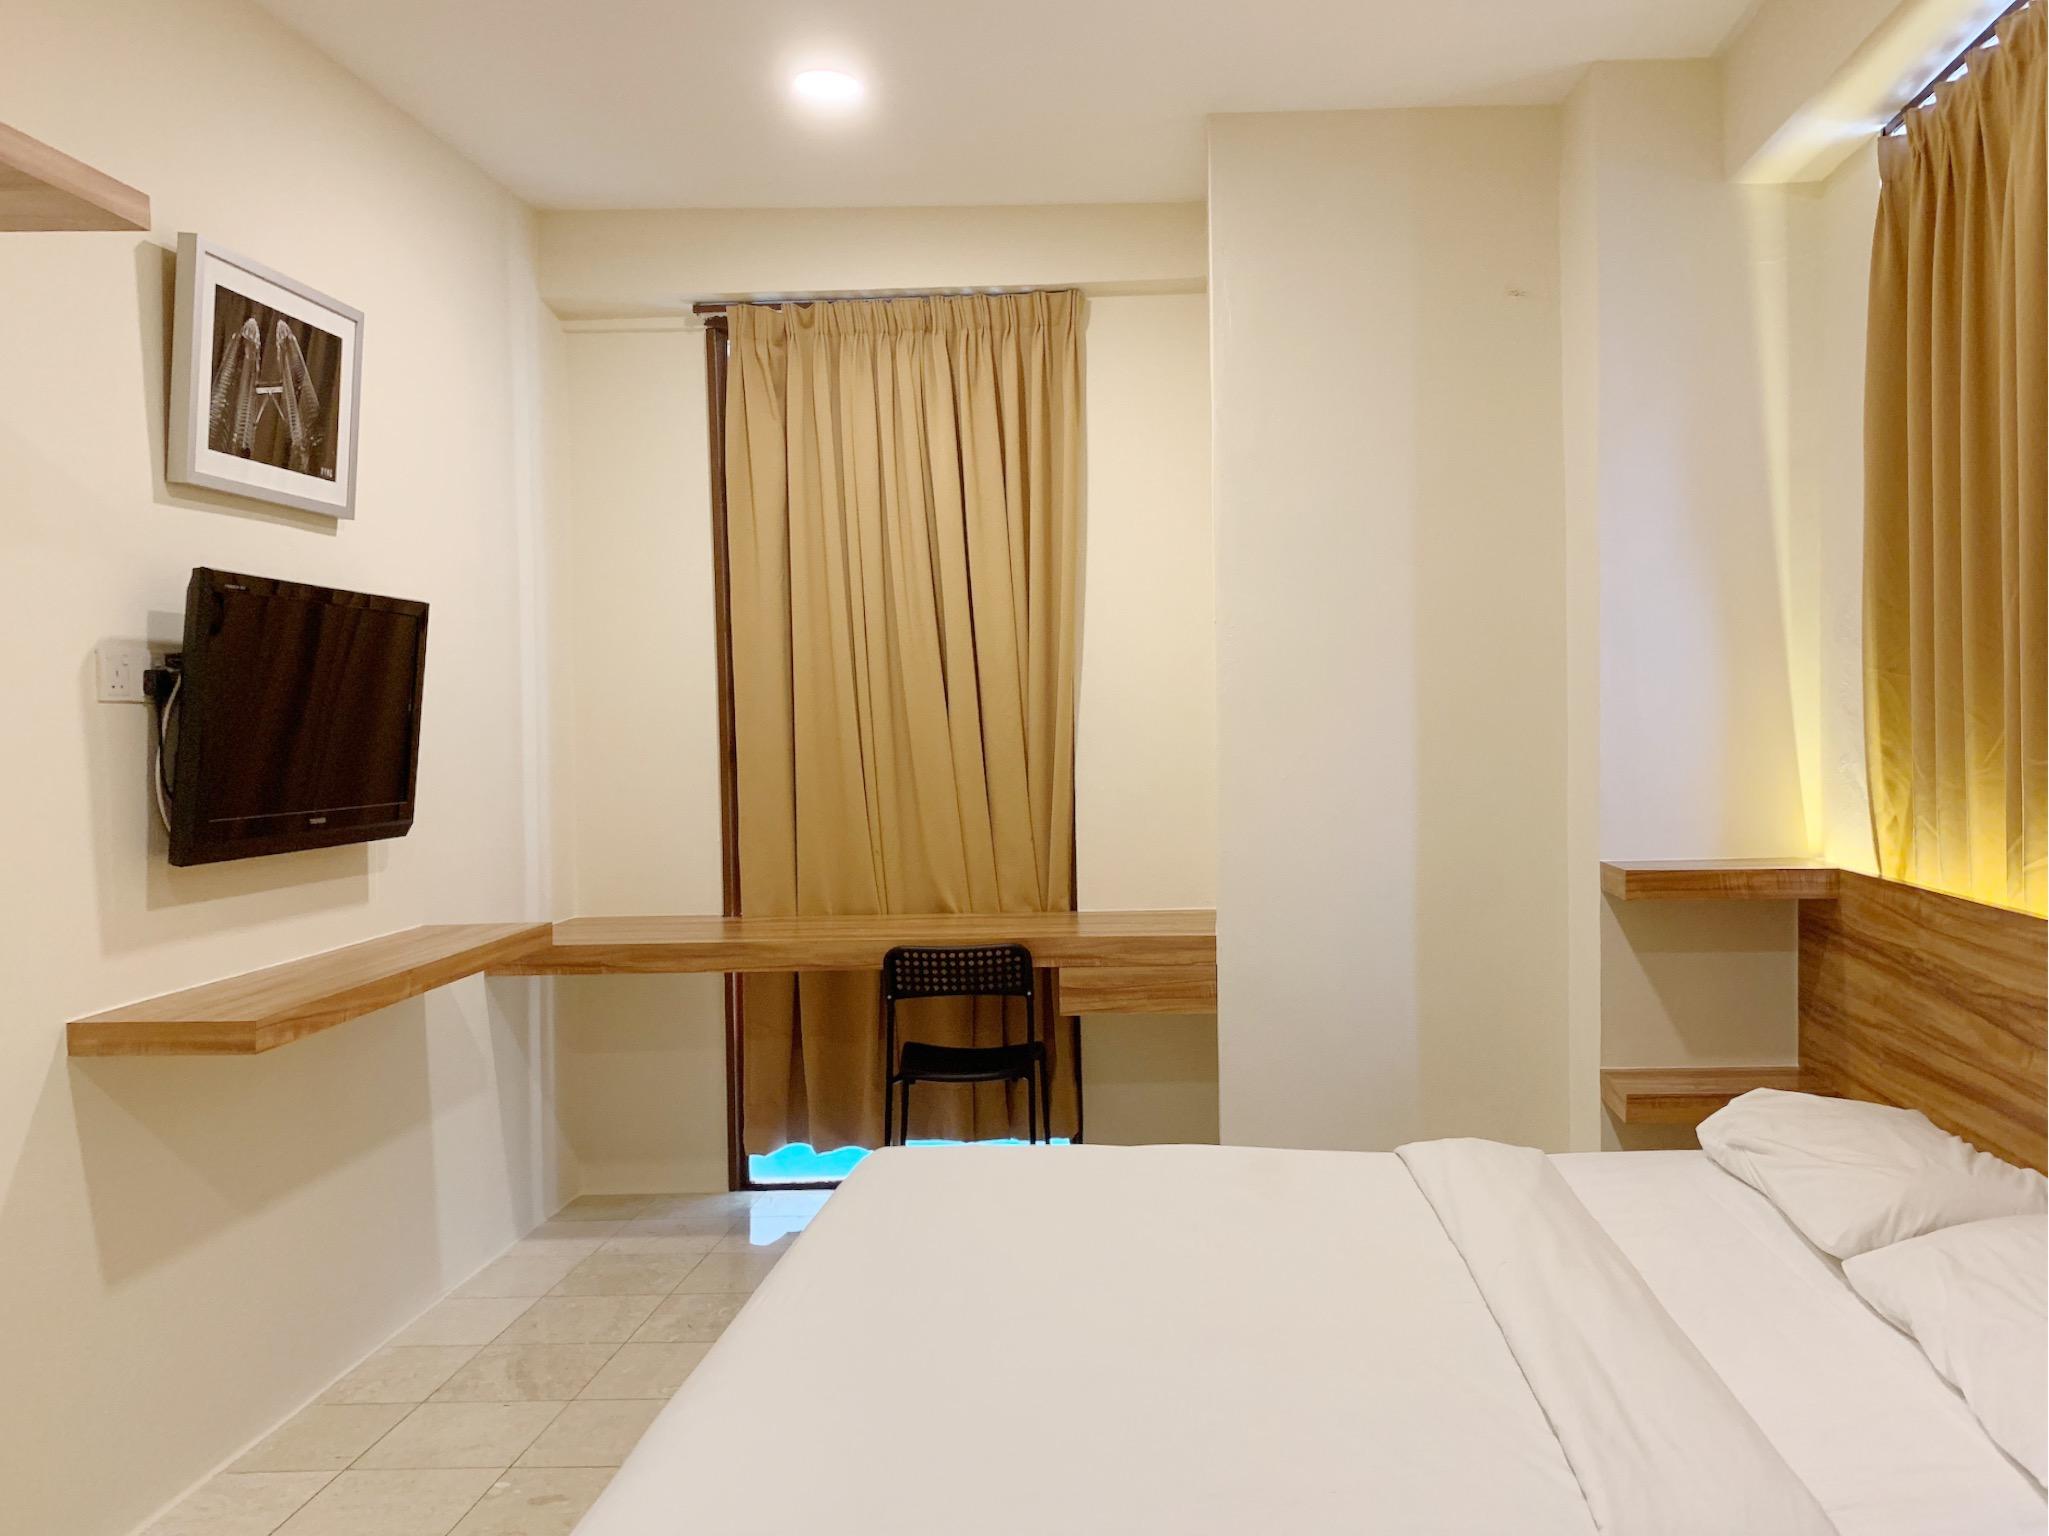 Premier Room - Newly Renovated at New Town Sunway Mentari